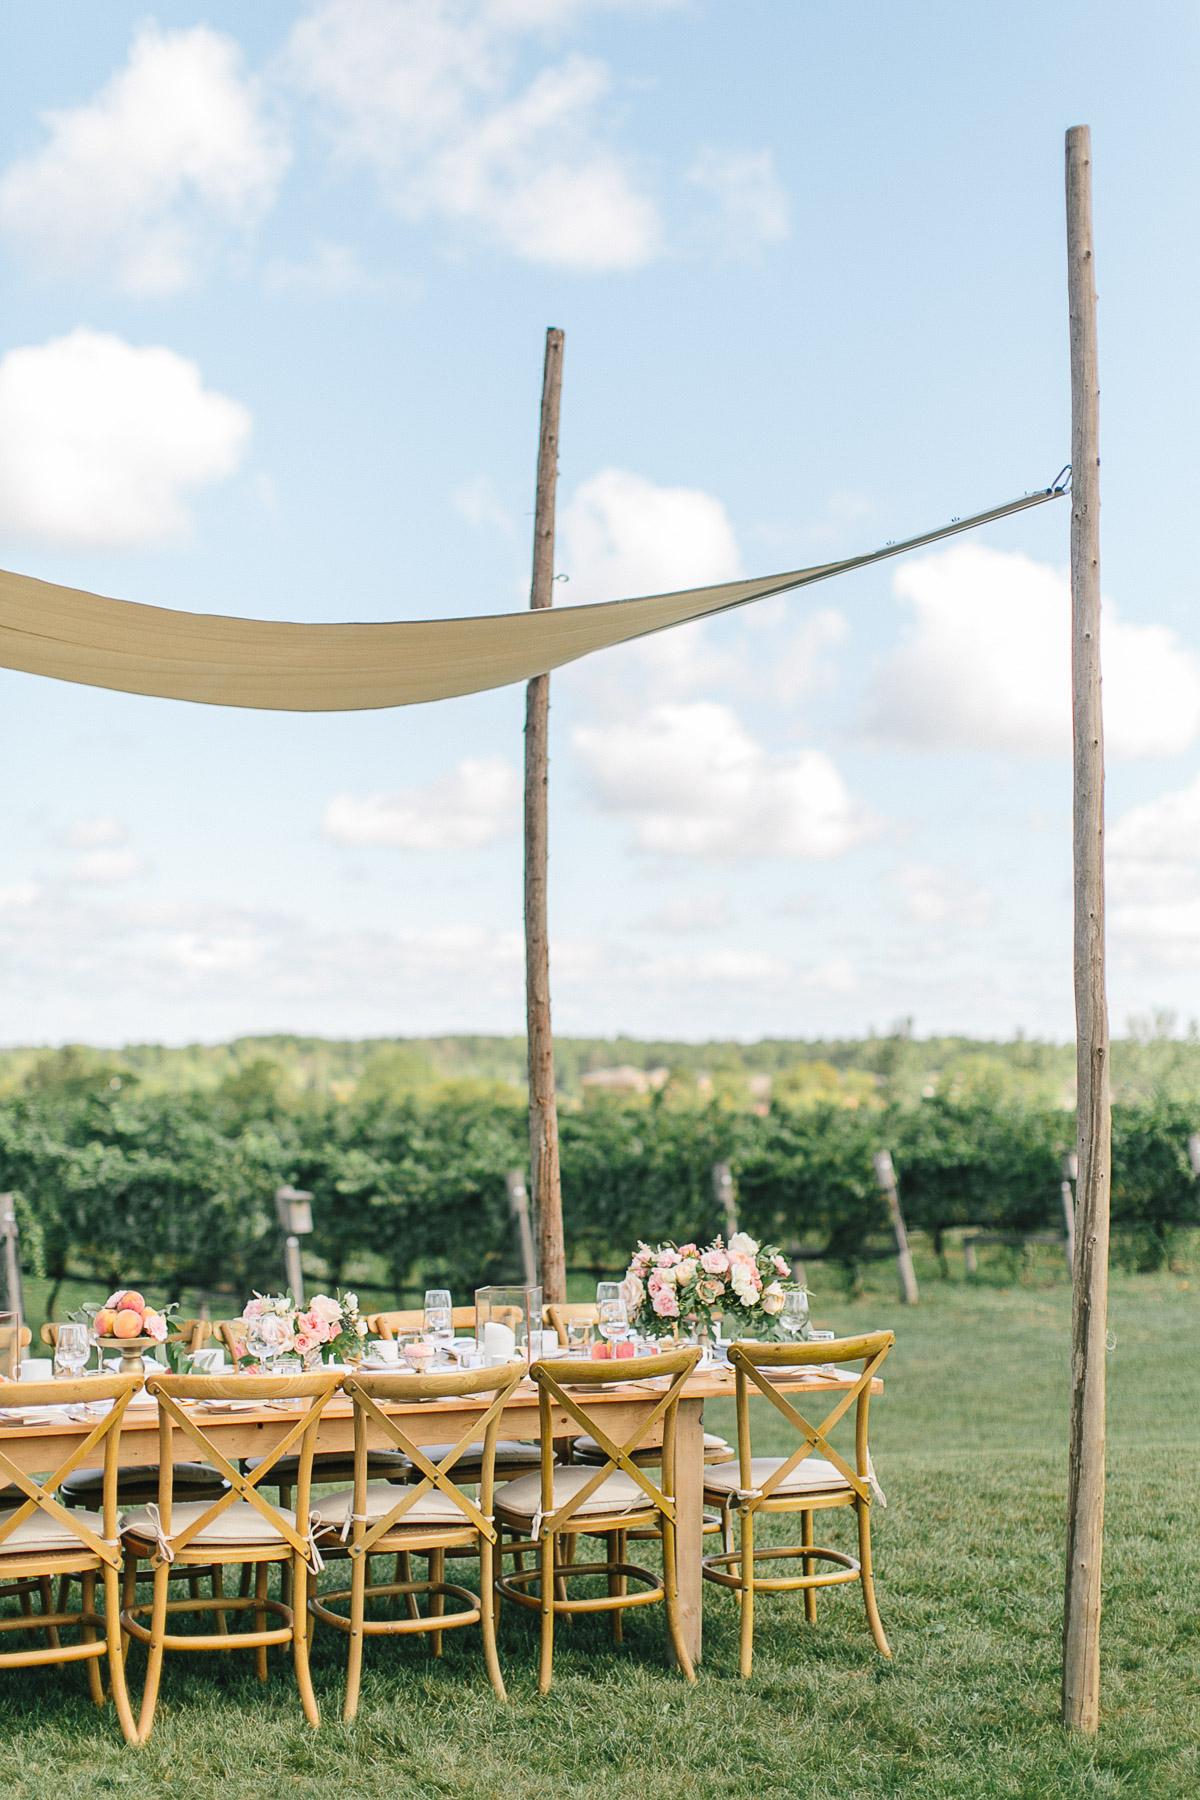 tamara-lockwood-photography-vineyard-bride-swish-list-ravine-vineyard-niagara-on-the-lake-editorial-1.jpg